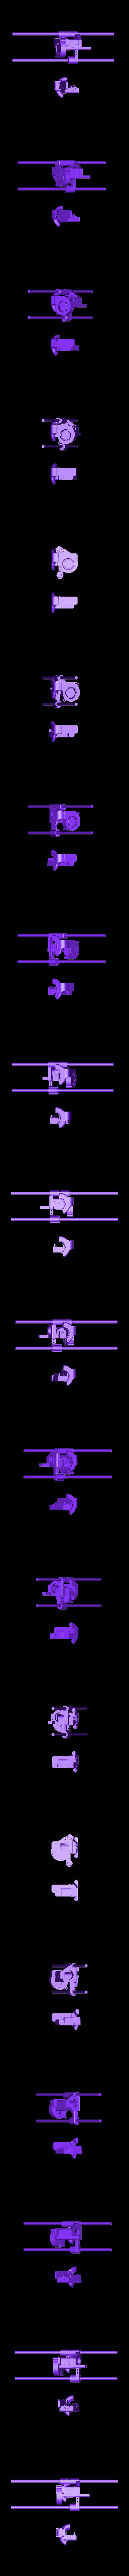 preview.stl Download free STL file E3D Extruder • 3D printer template, indigo4